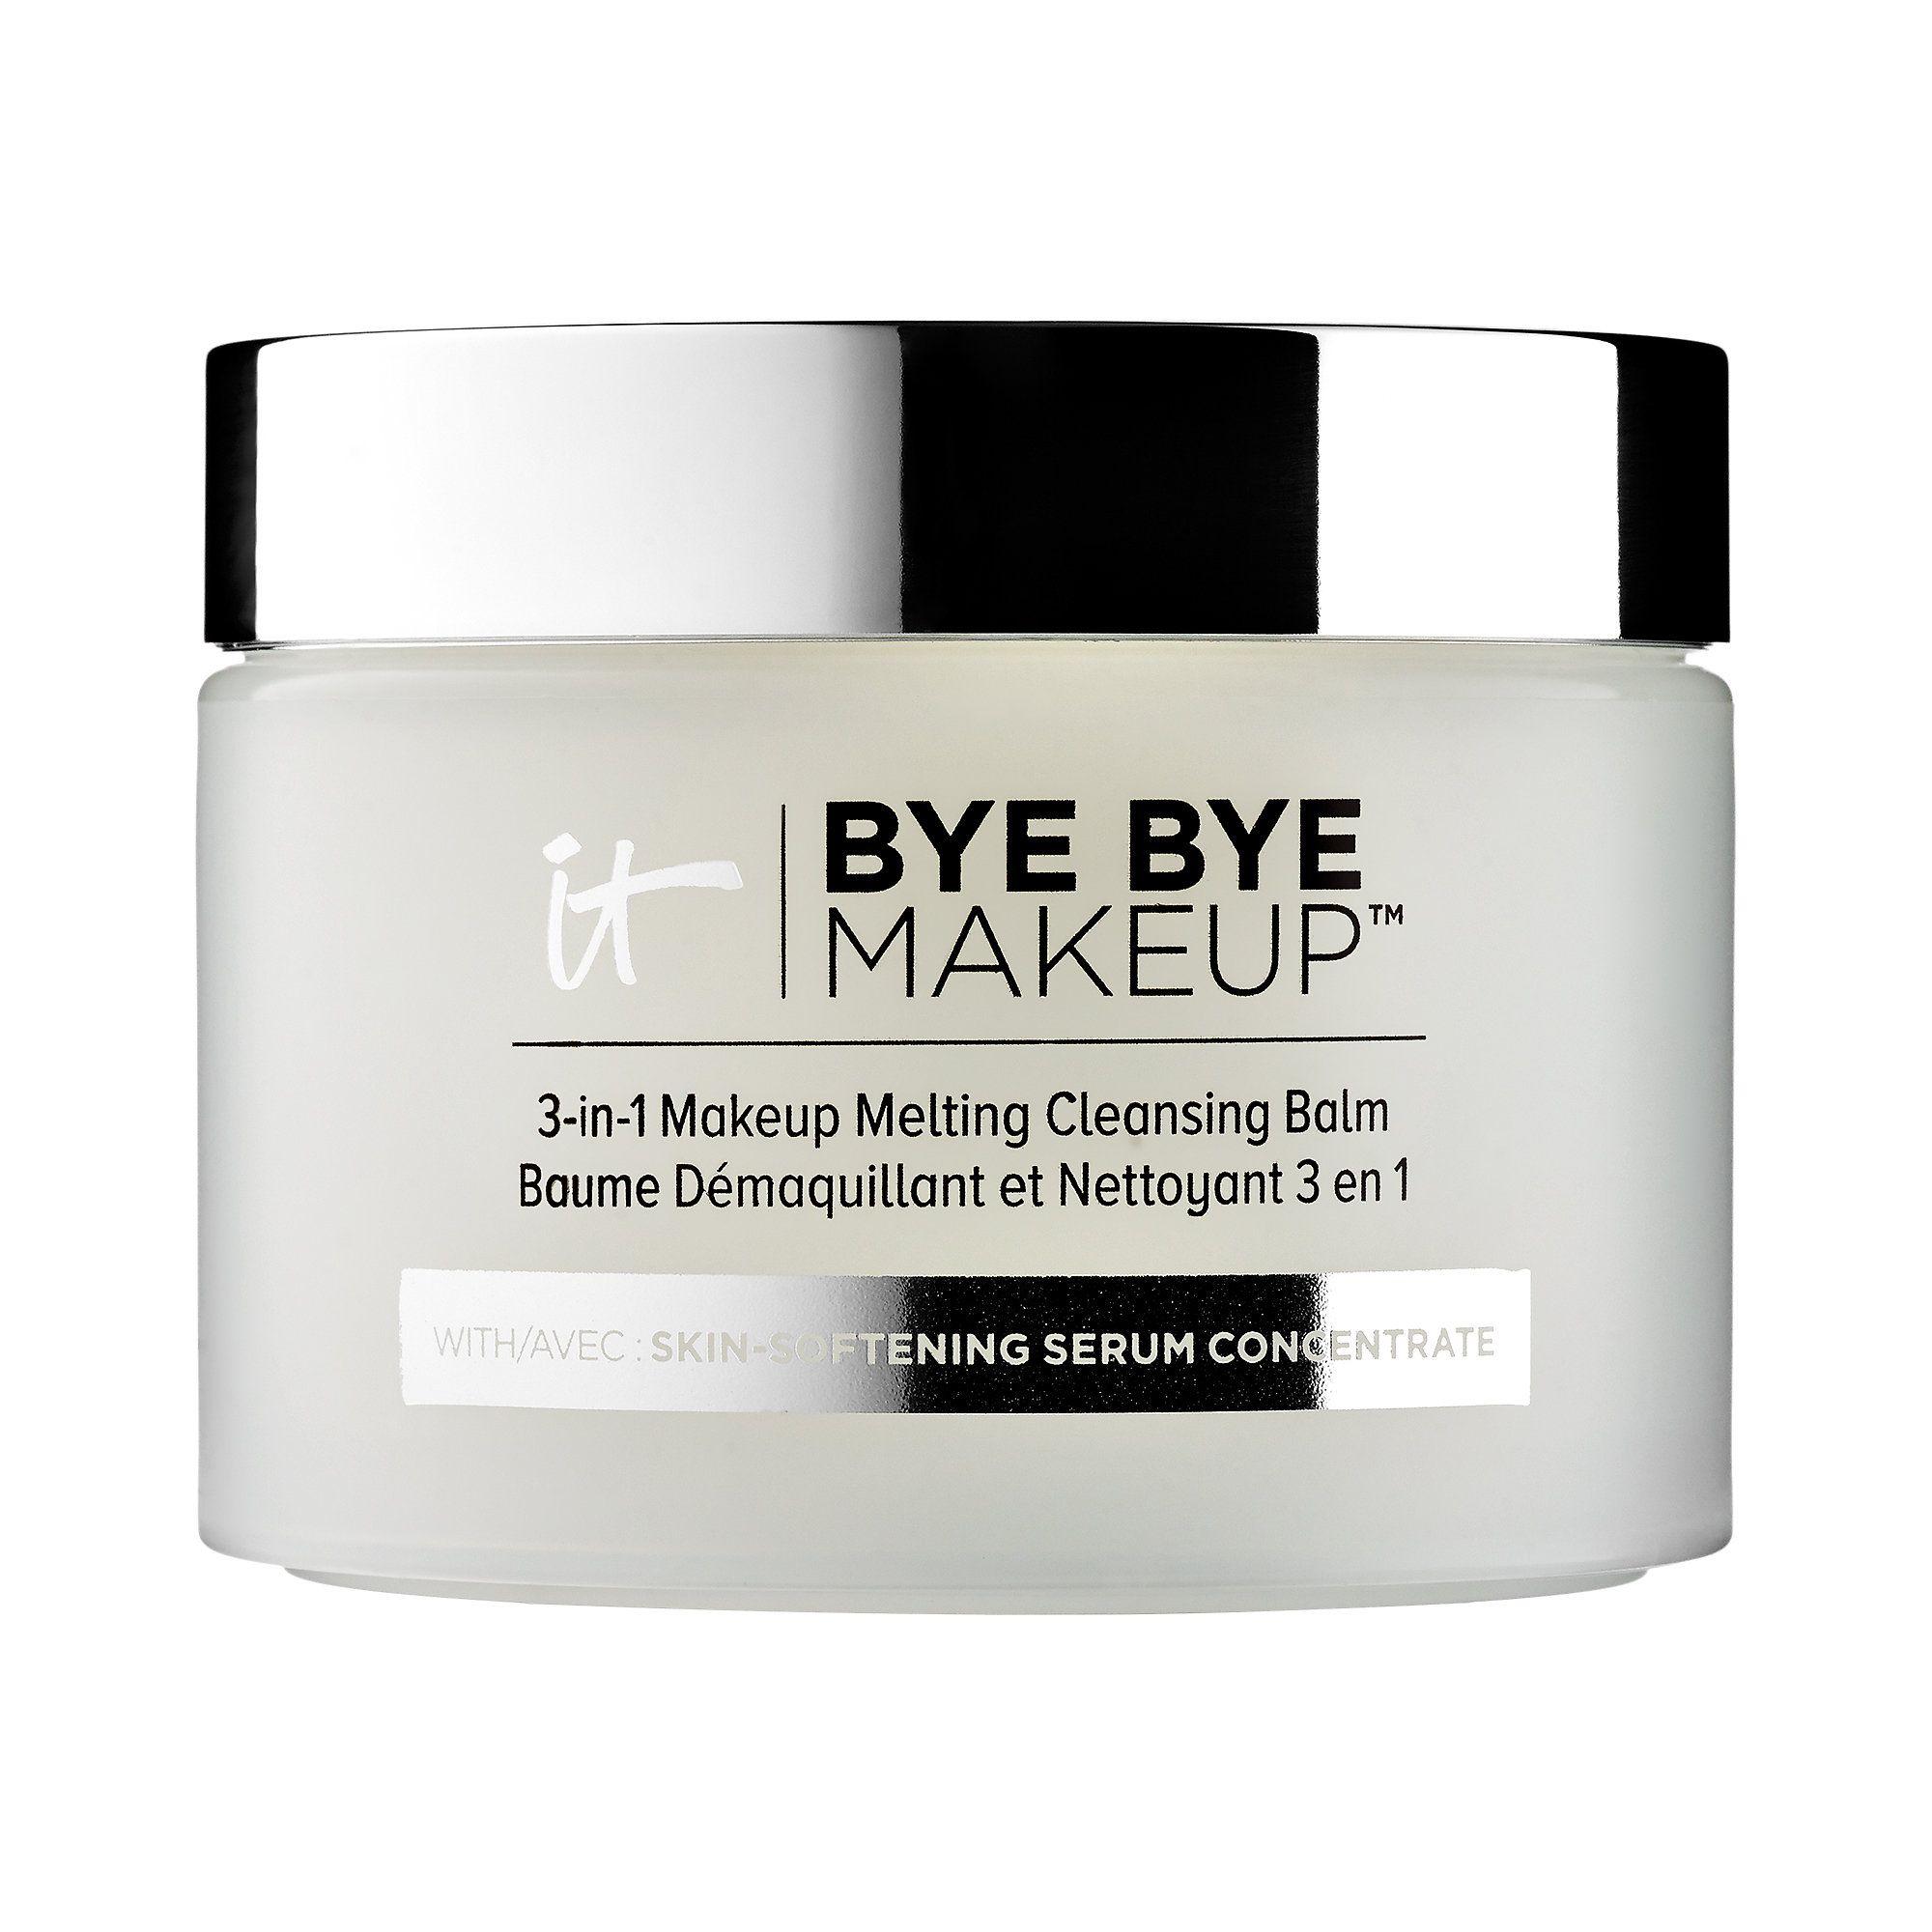 Shop IT Cosmetics' Bye Bye Makeup™ 3in1 Makeup Melting